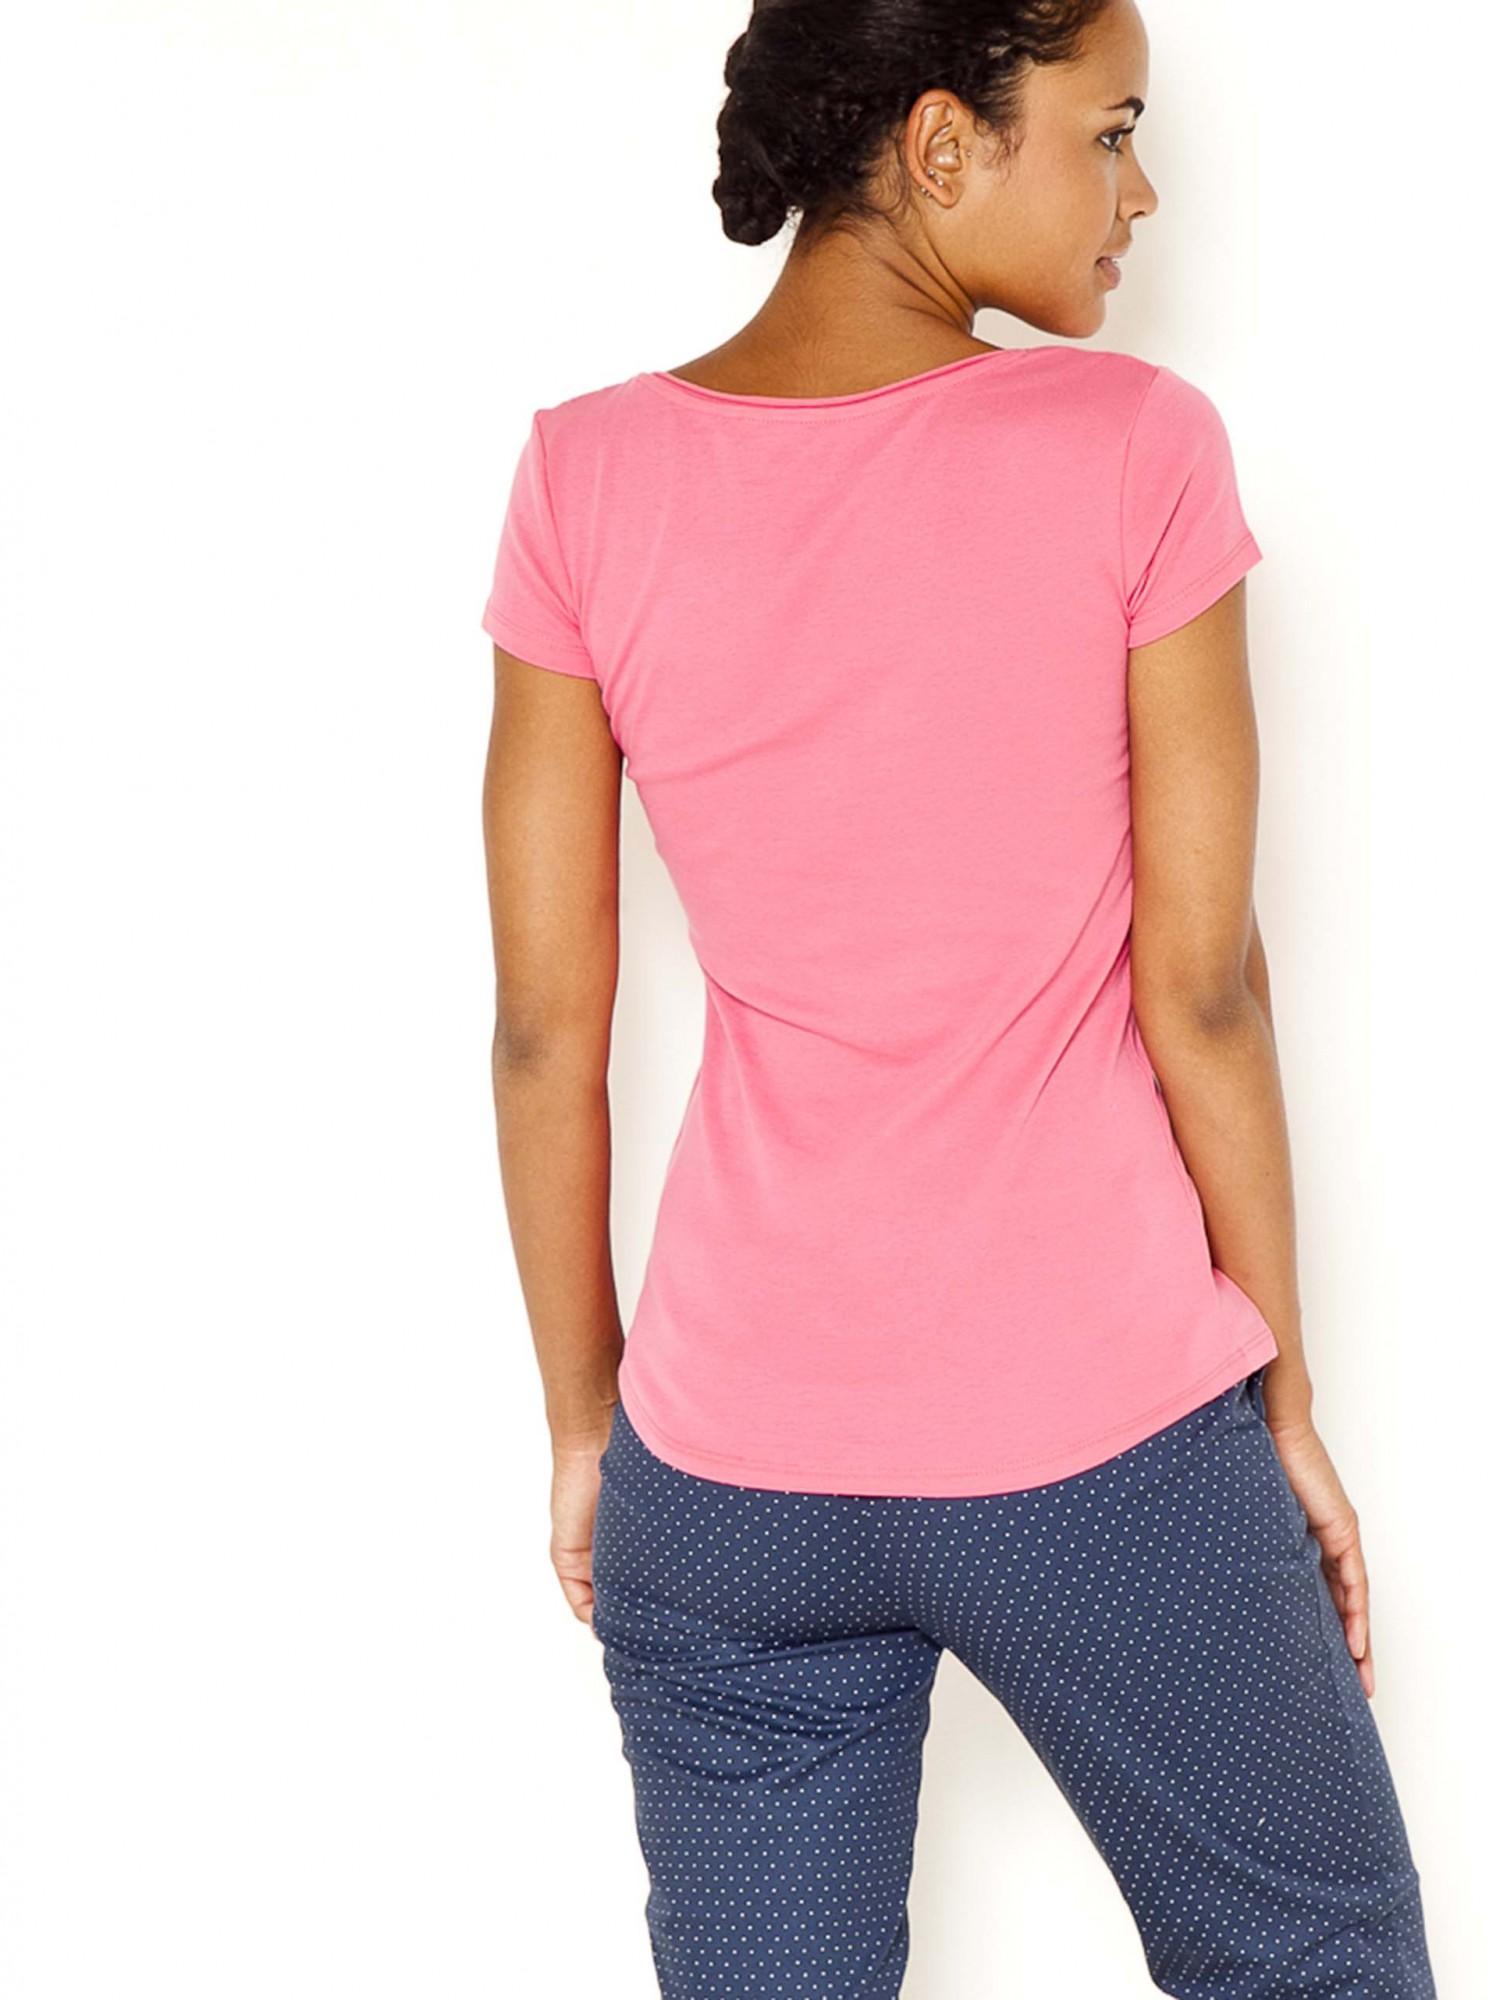 CAMAIEU Women's t-shirt pink